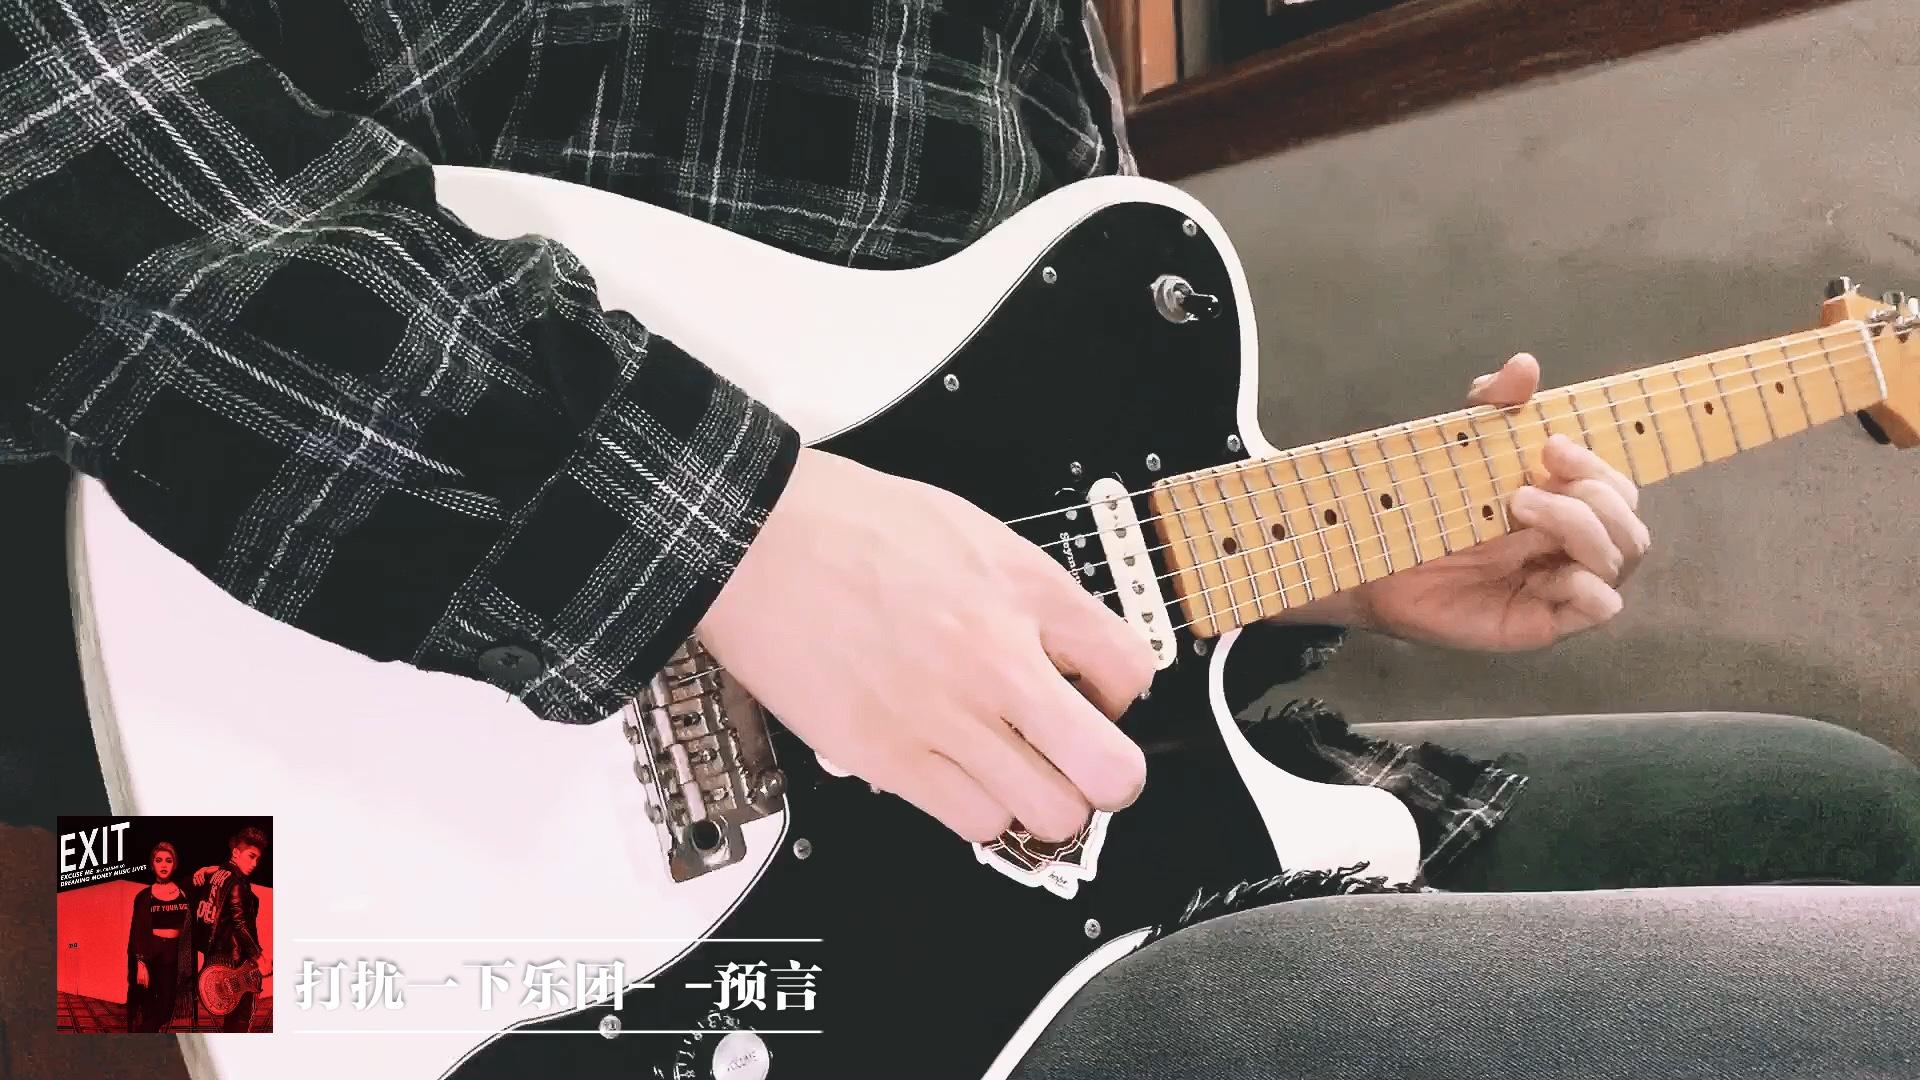 [Guitar Cover]Excuse me打扰一下乐团- -预言